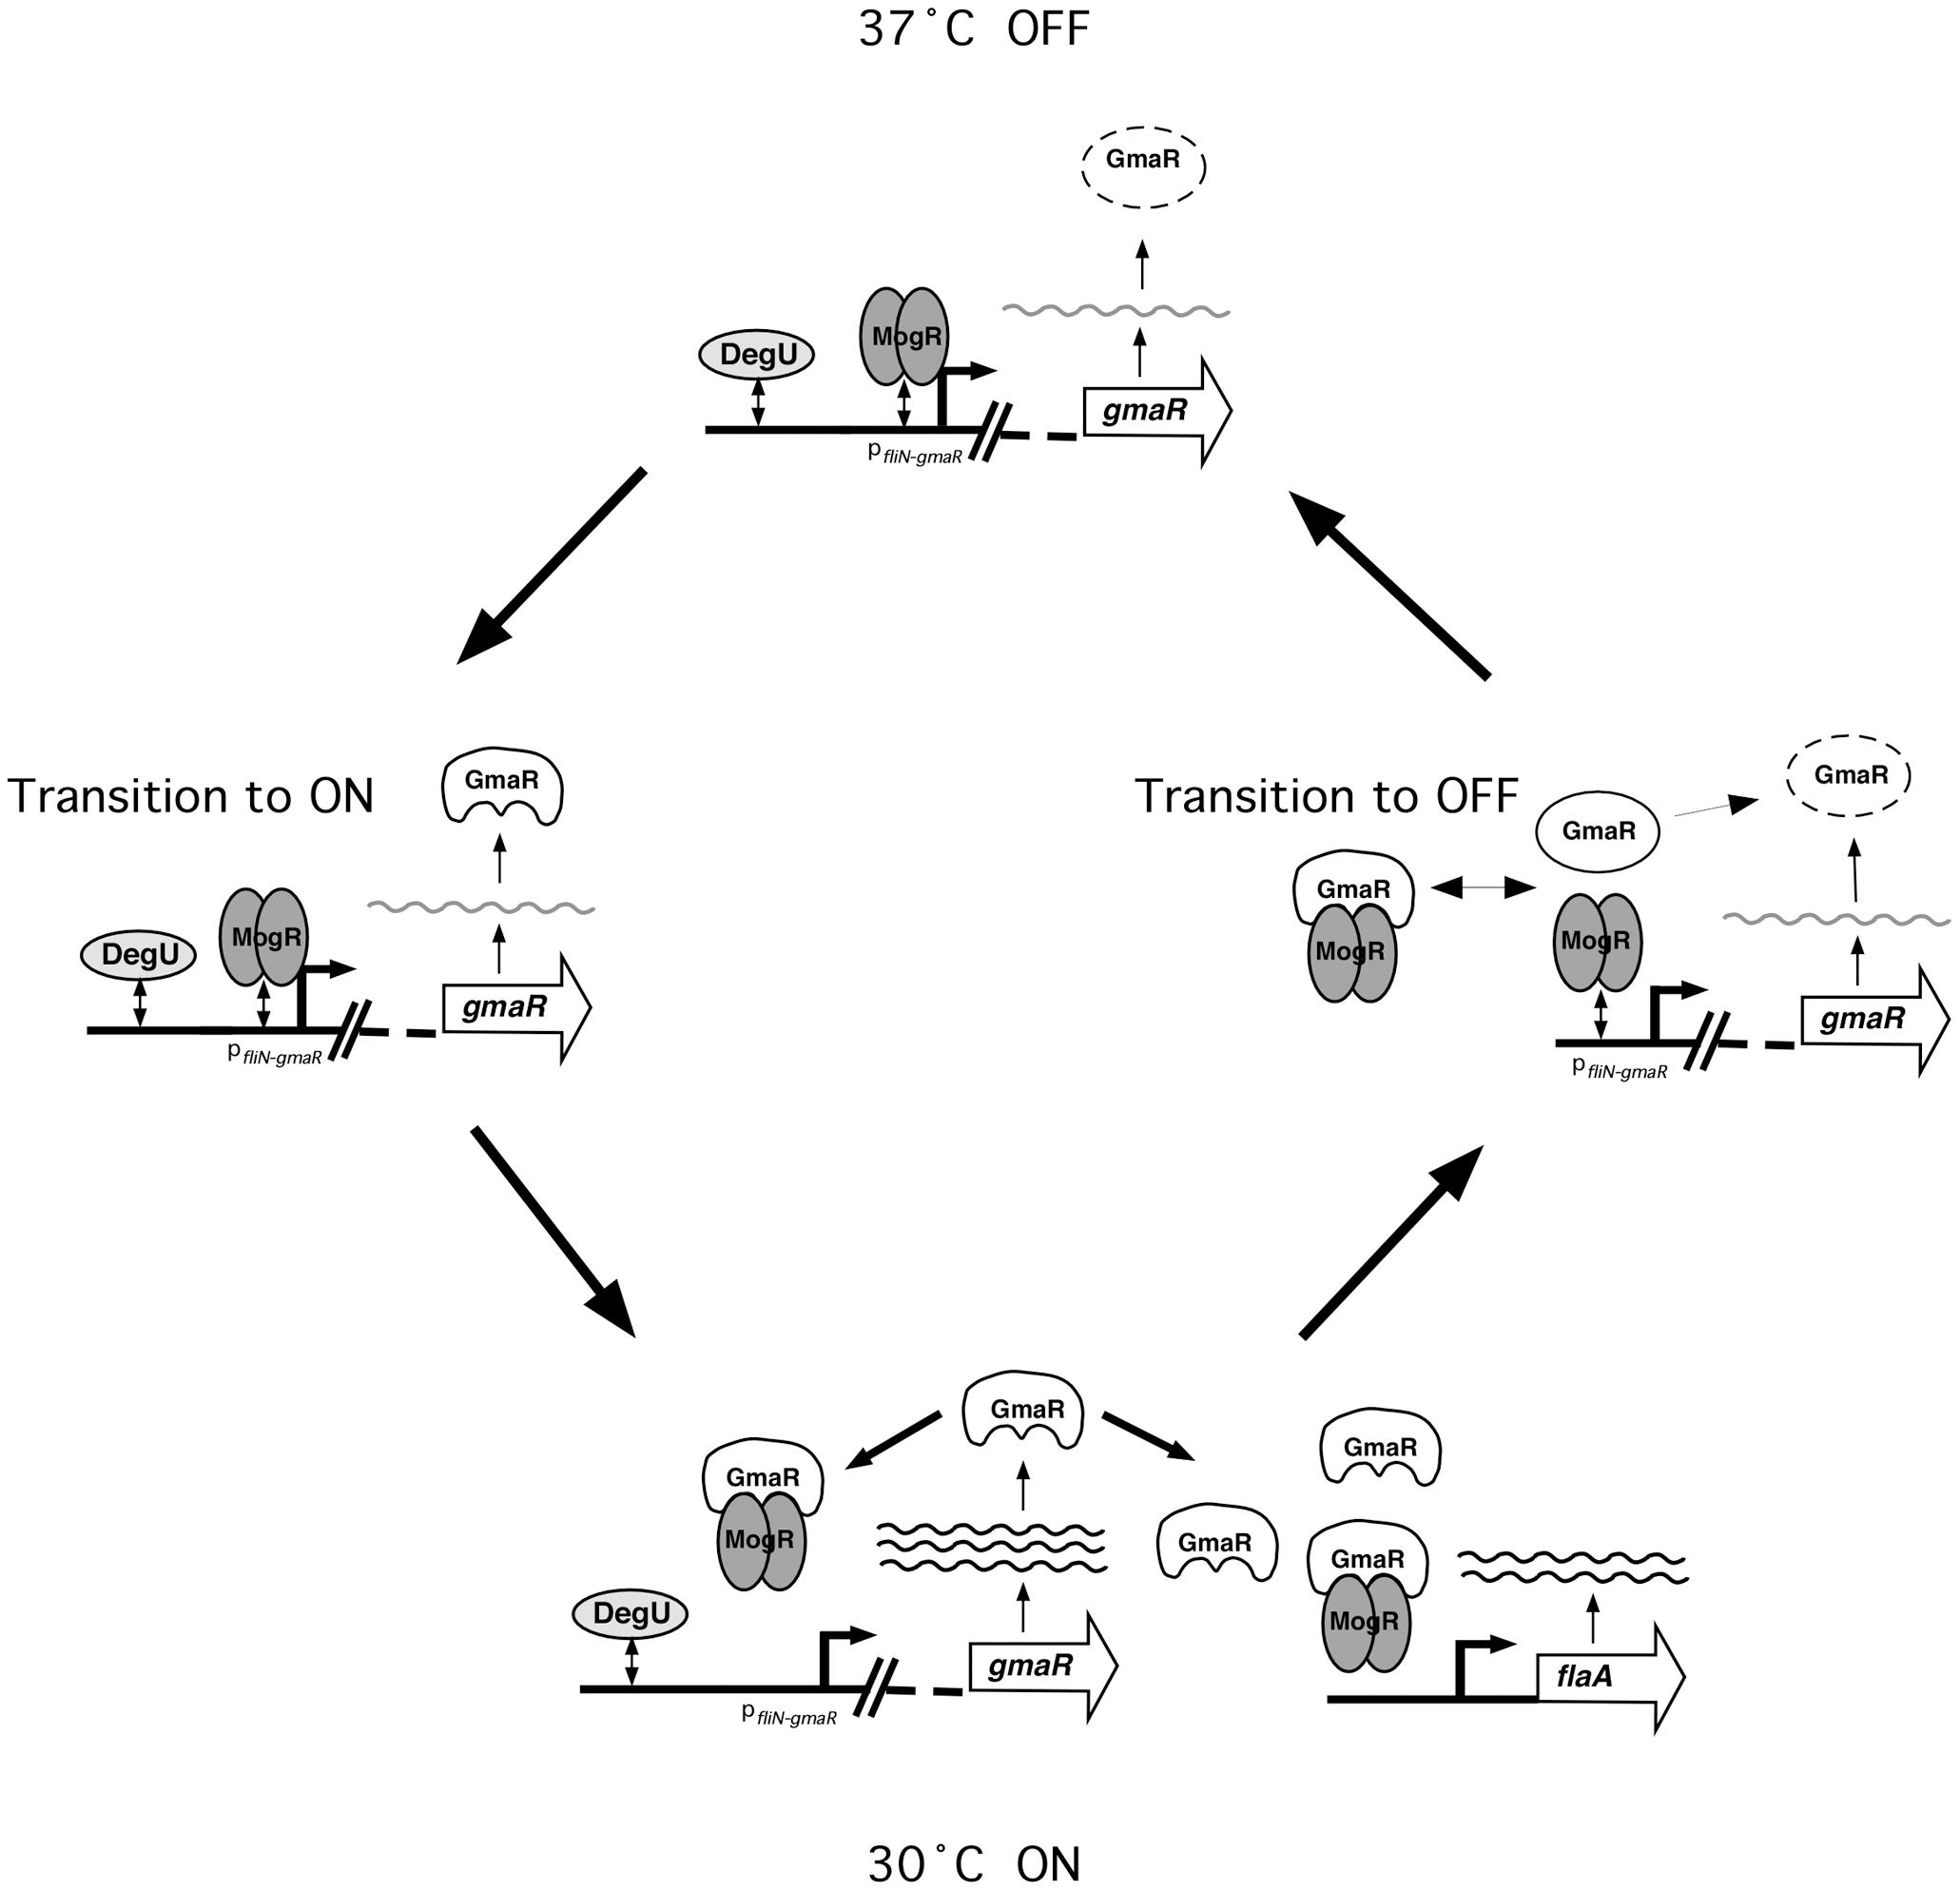 Model for the temperature-dependent regulation of GmaR expression and flagellar motility gene transcription in <i>Lm</i>.